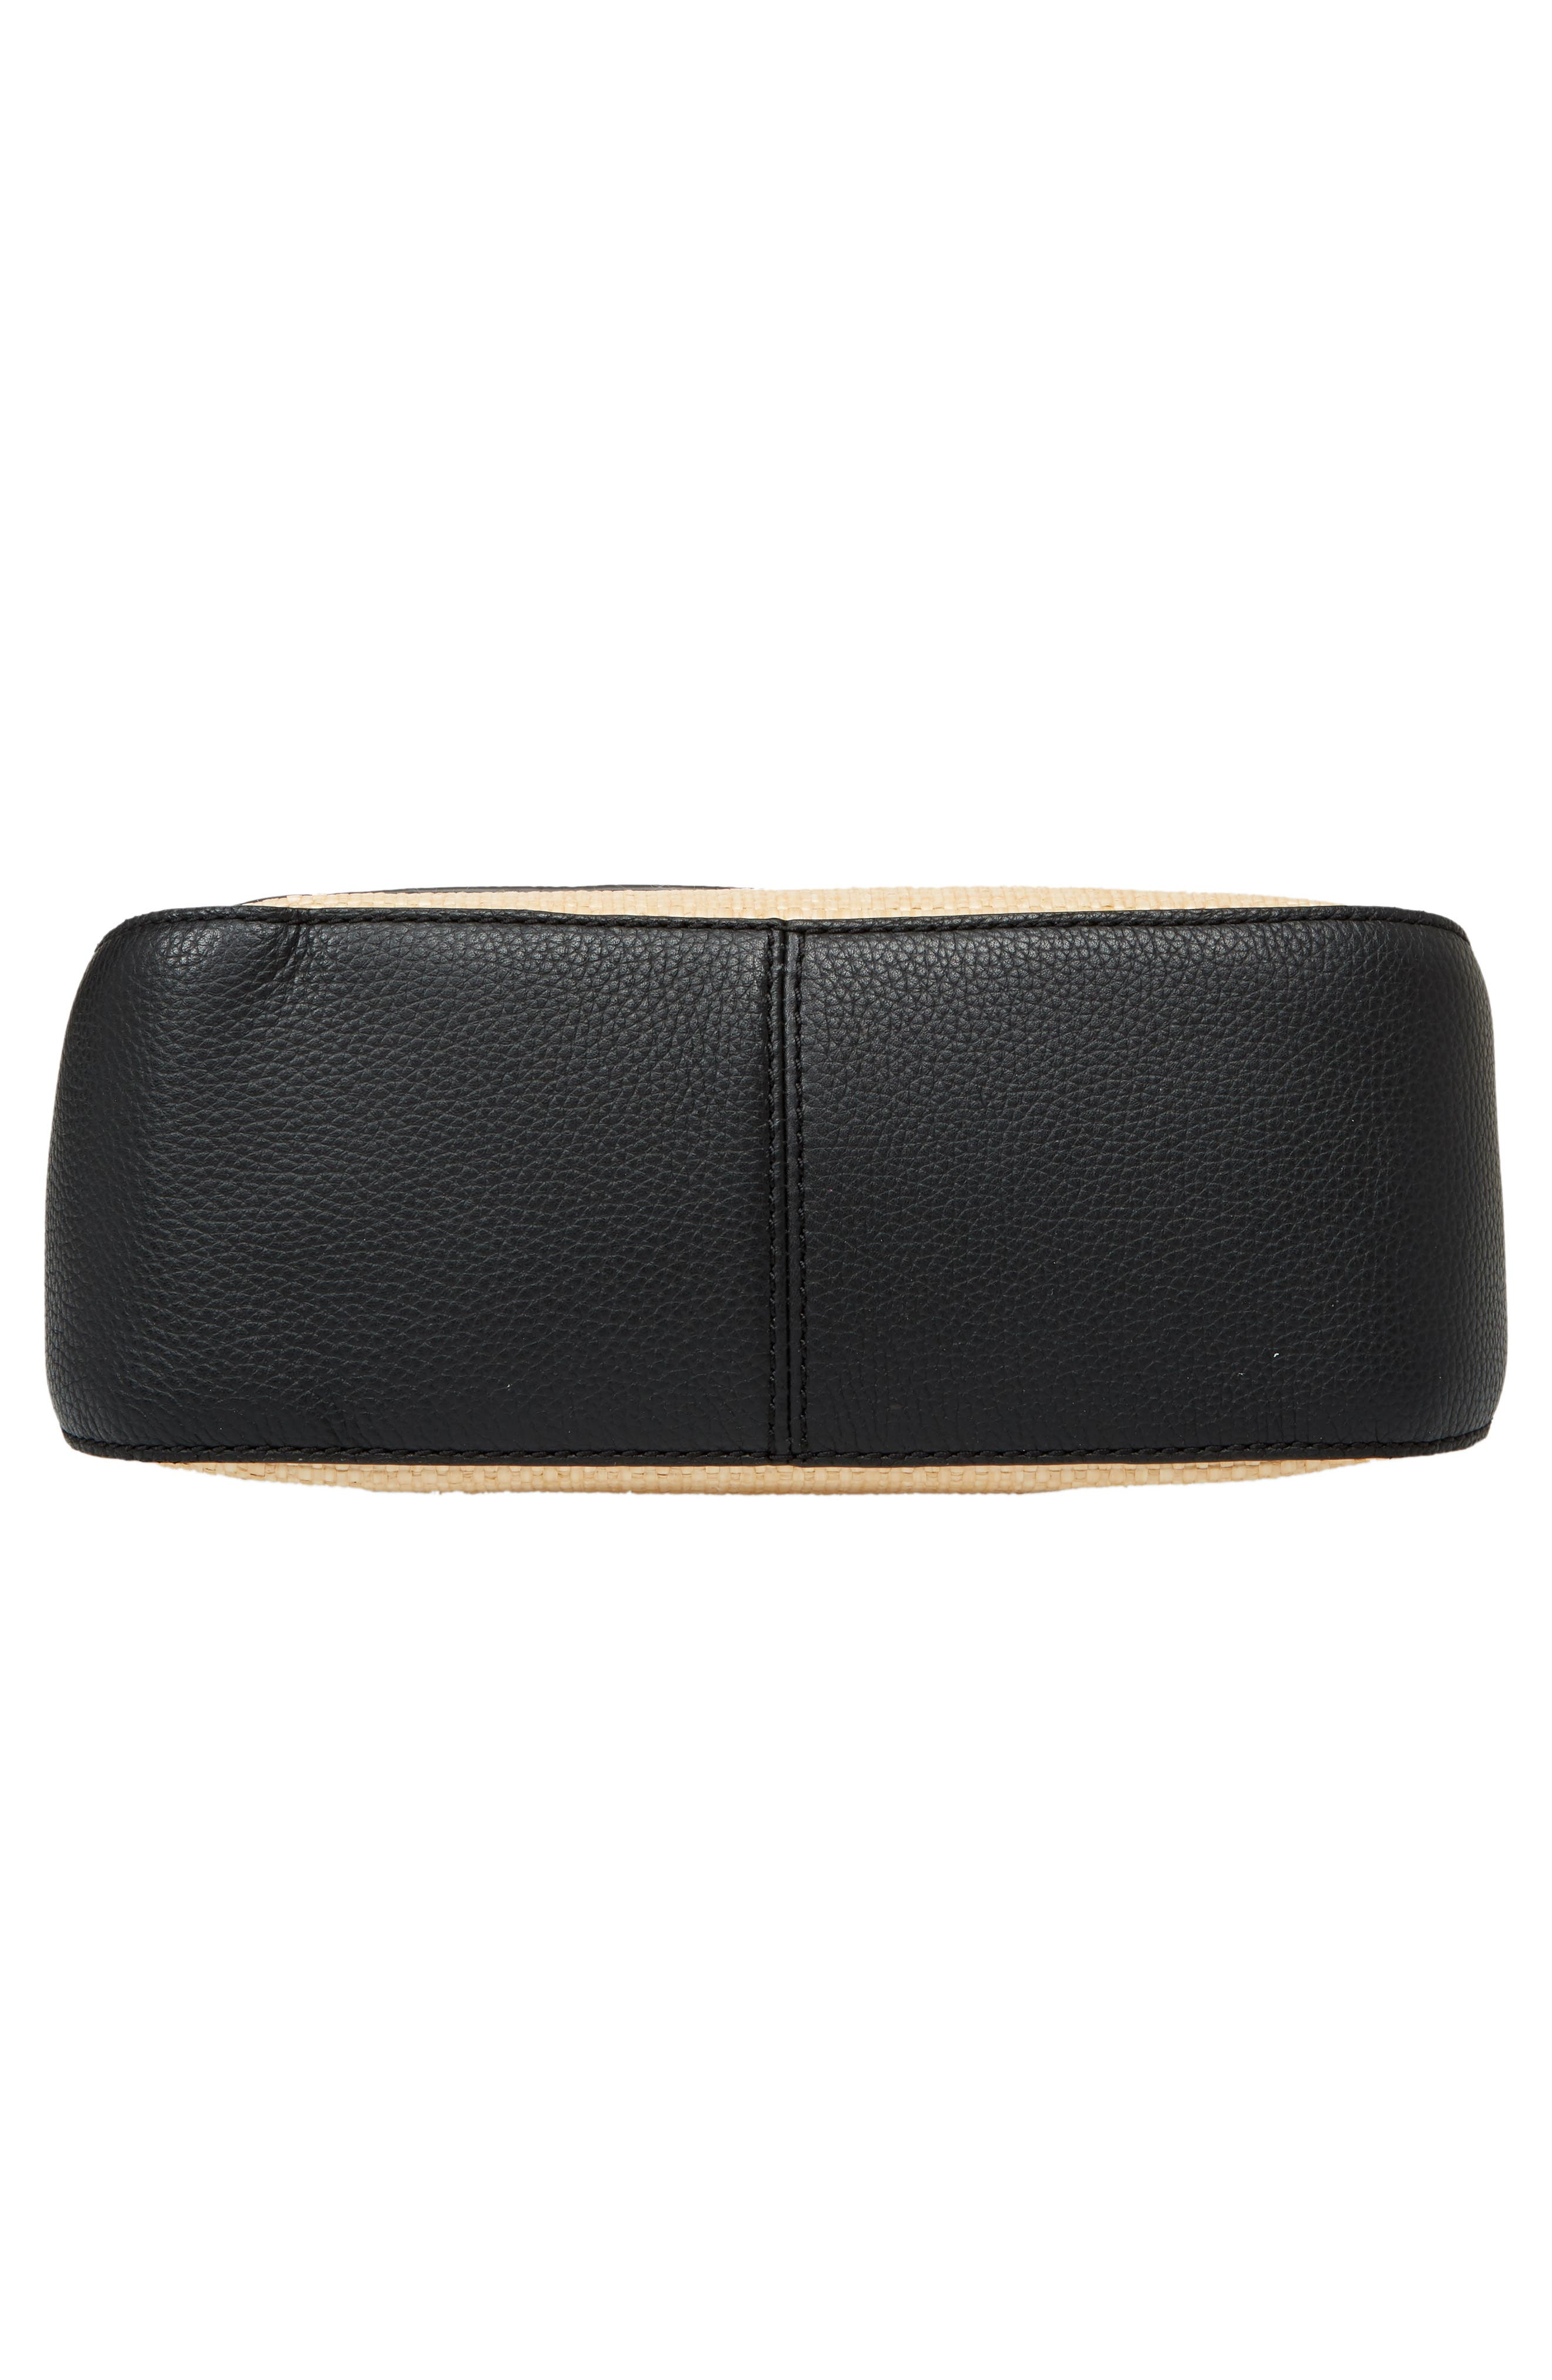 KATE SPADE NEW YORK,                             jackson street - colette straw & leather satchel,                             Alternate thumbnail 6, color,                             257